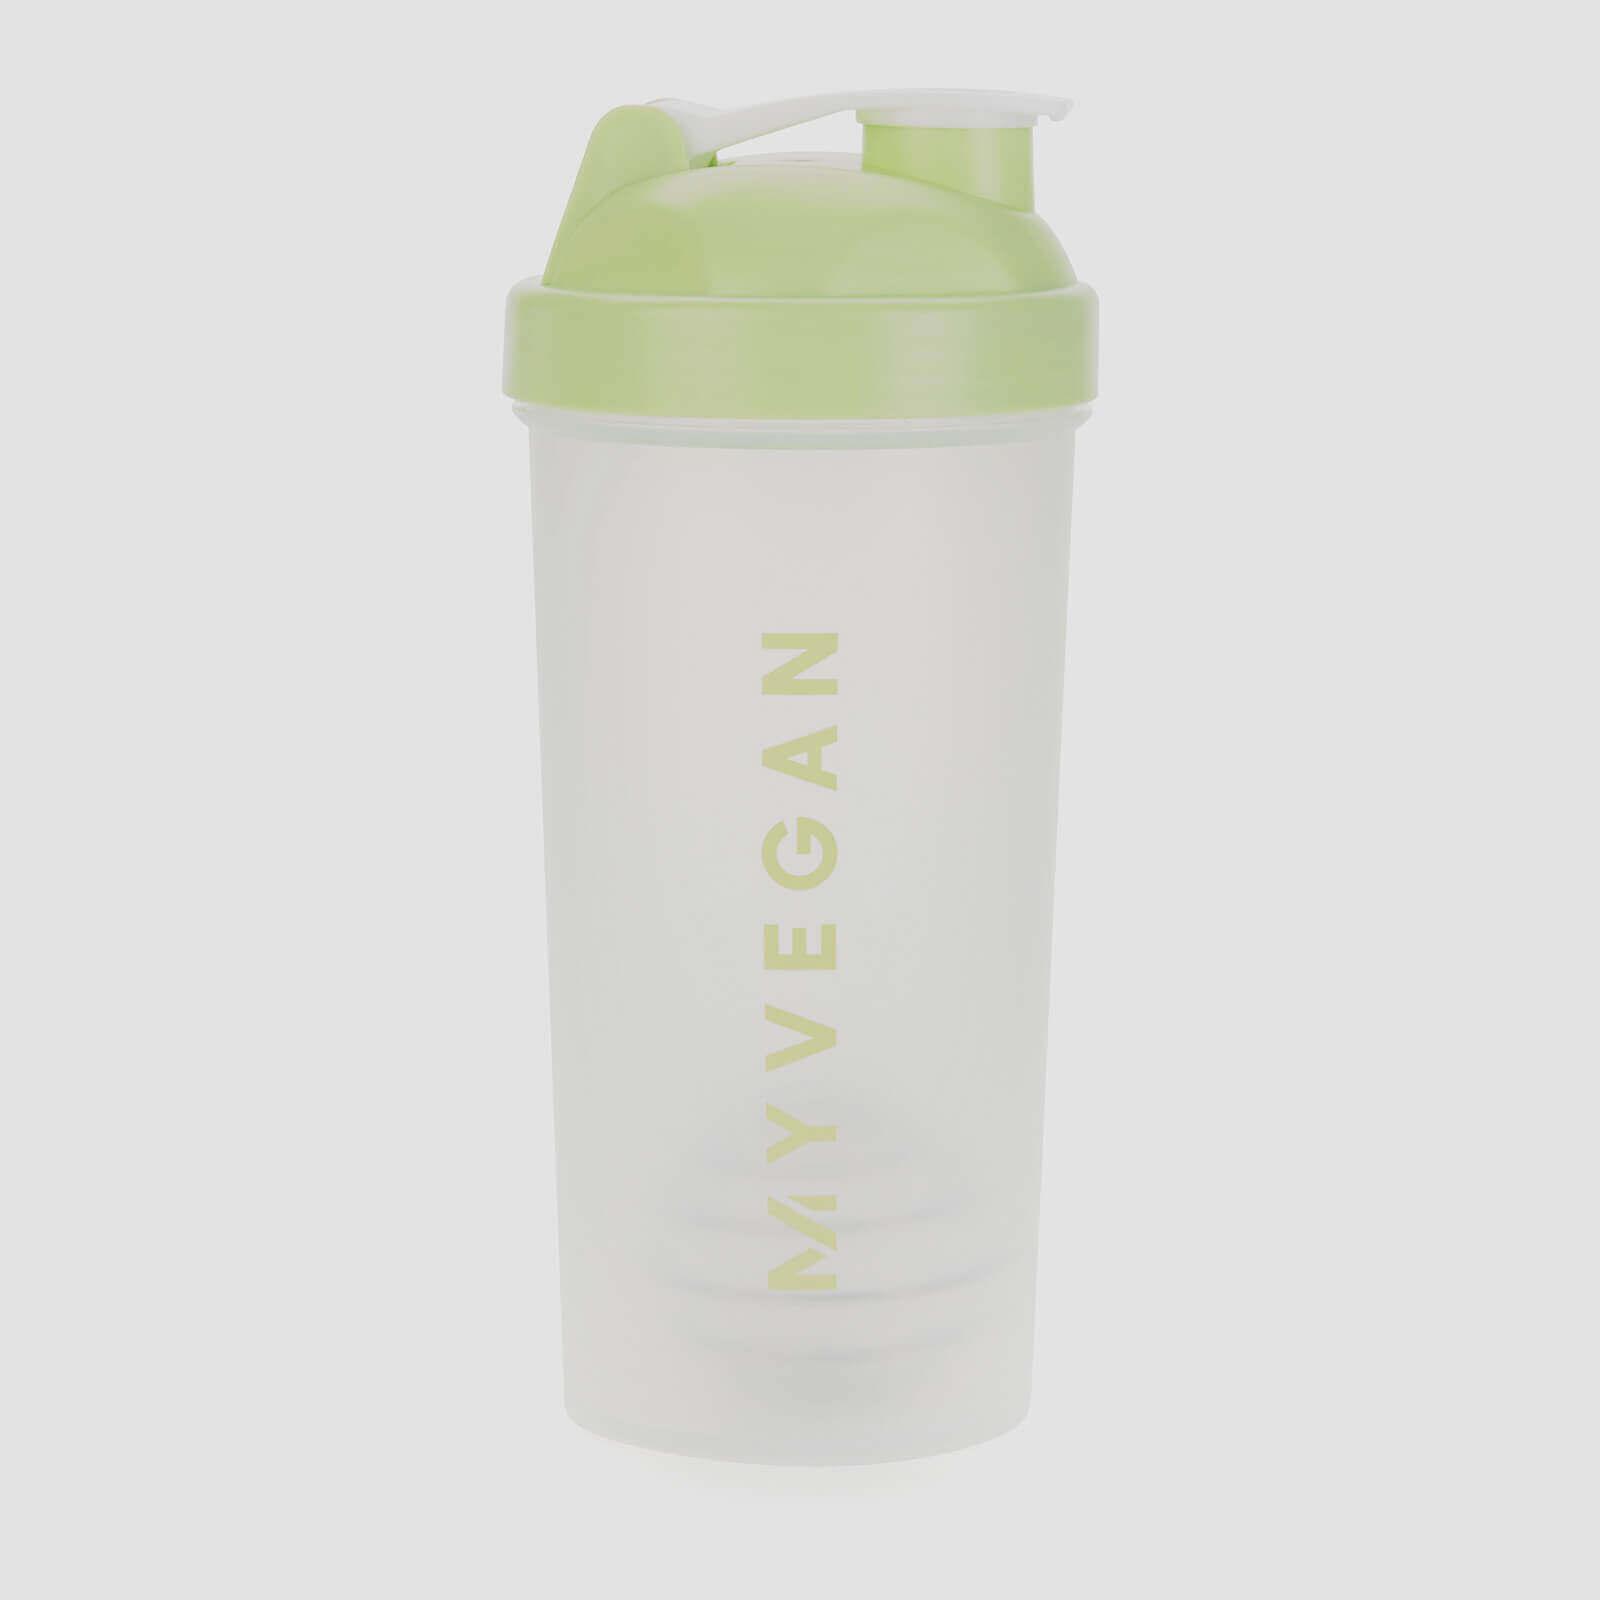 Myvegan Shaker Bottle